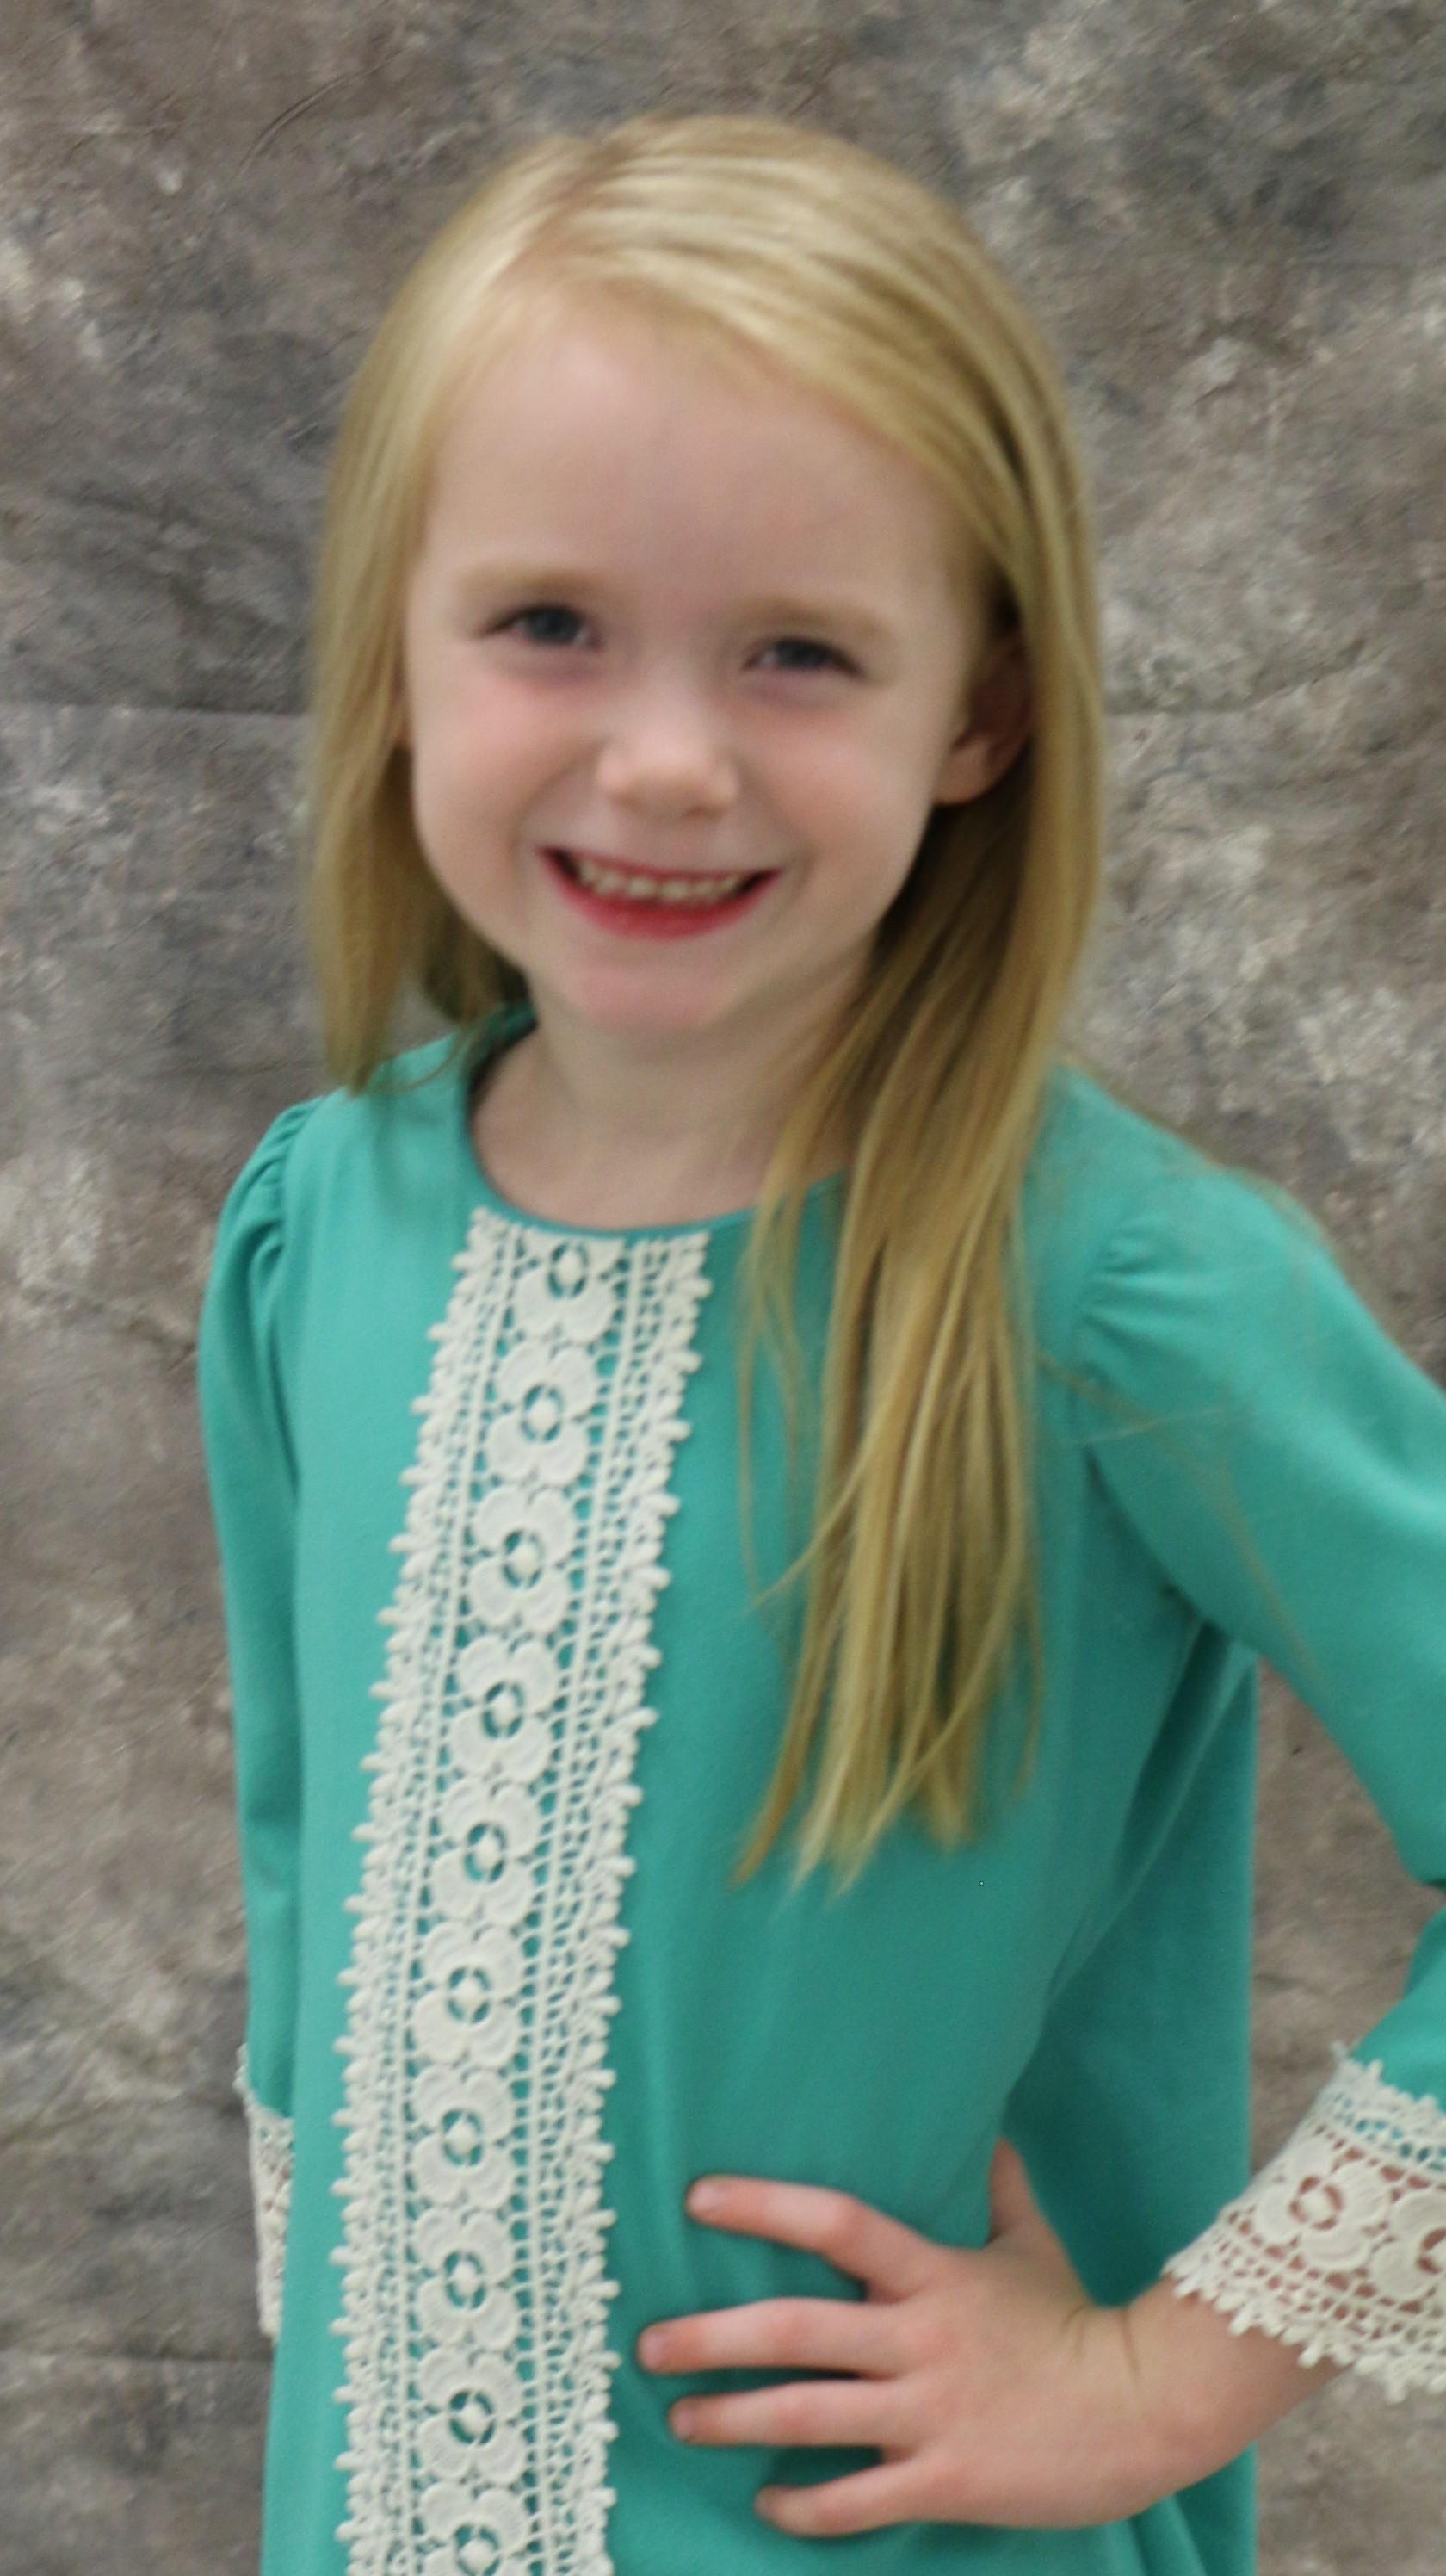 Little Miss Contestant - Avery Jo Carr 6